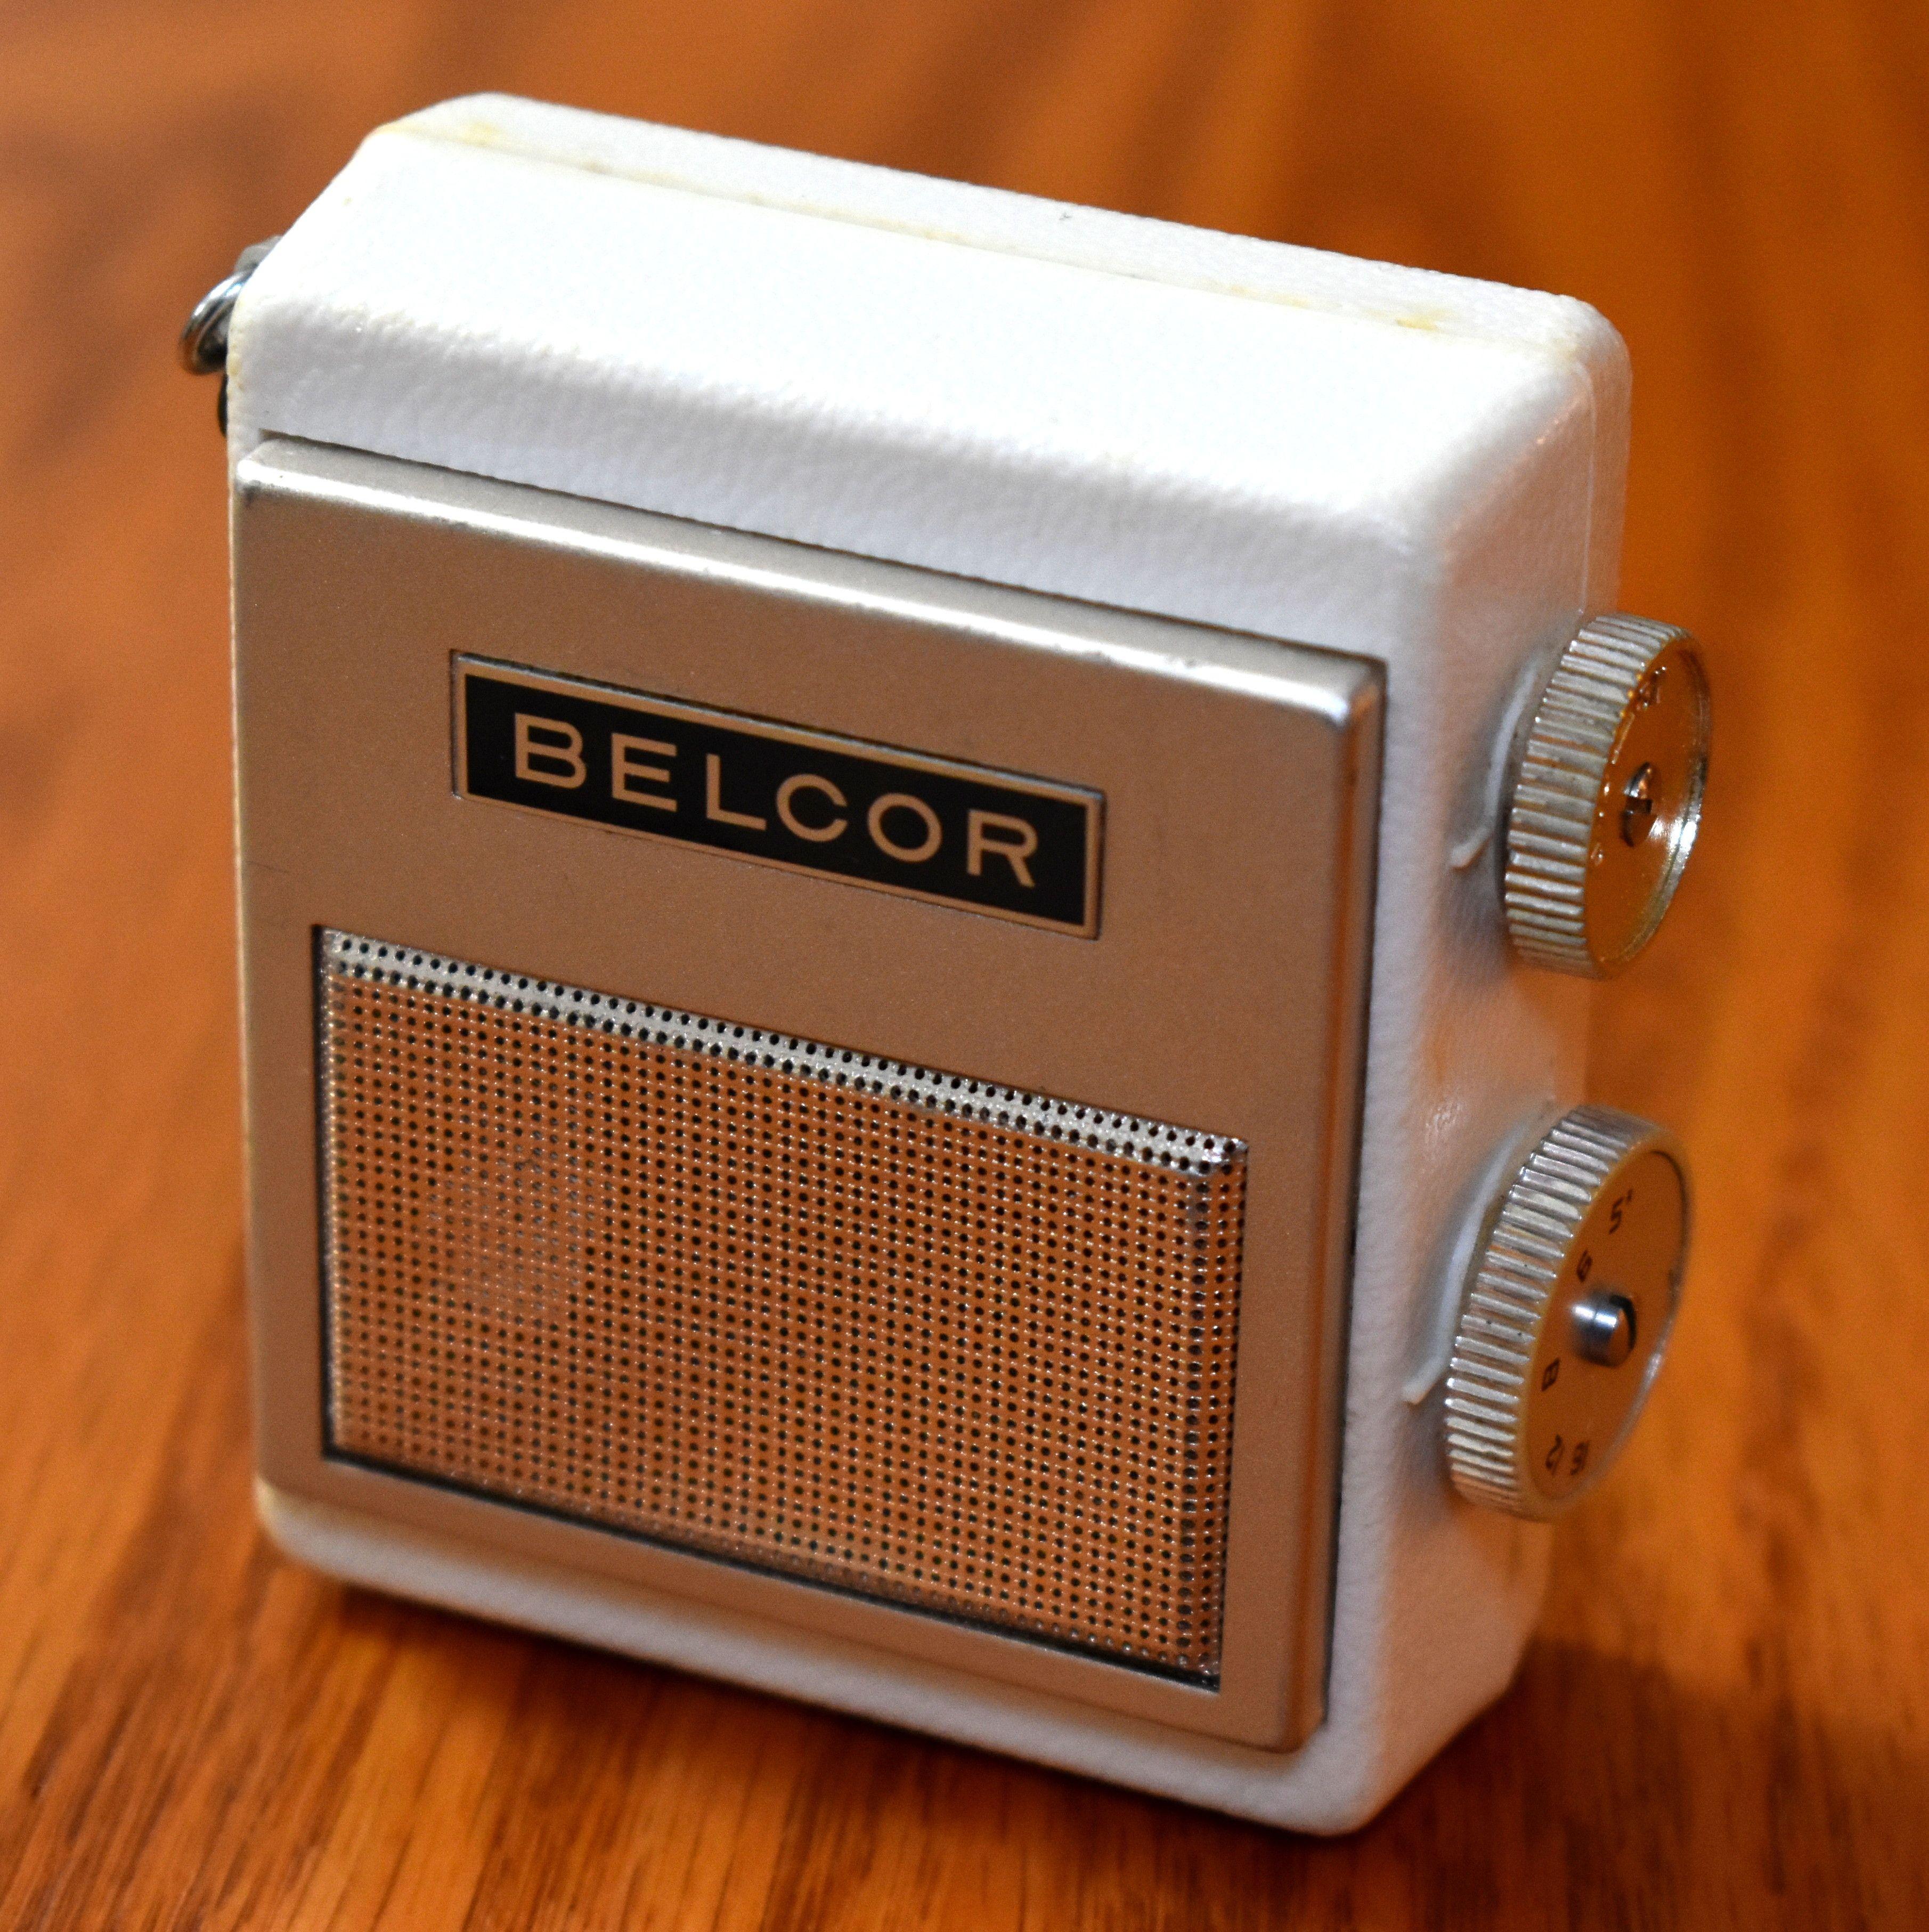 Vintage Belcor Micro 7-Transistor Radio (No Model Number